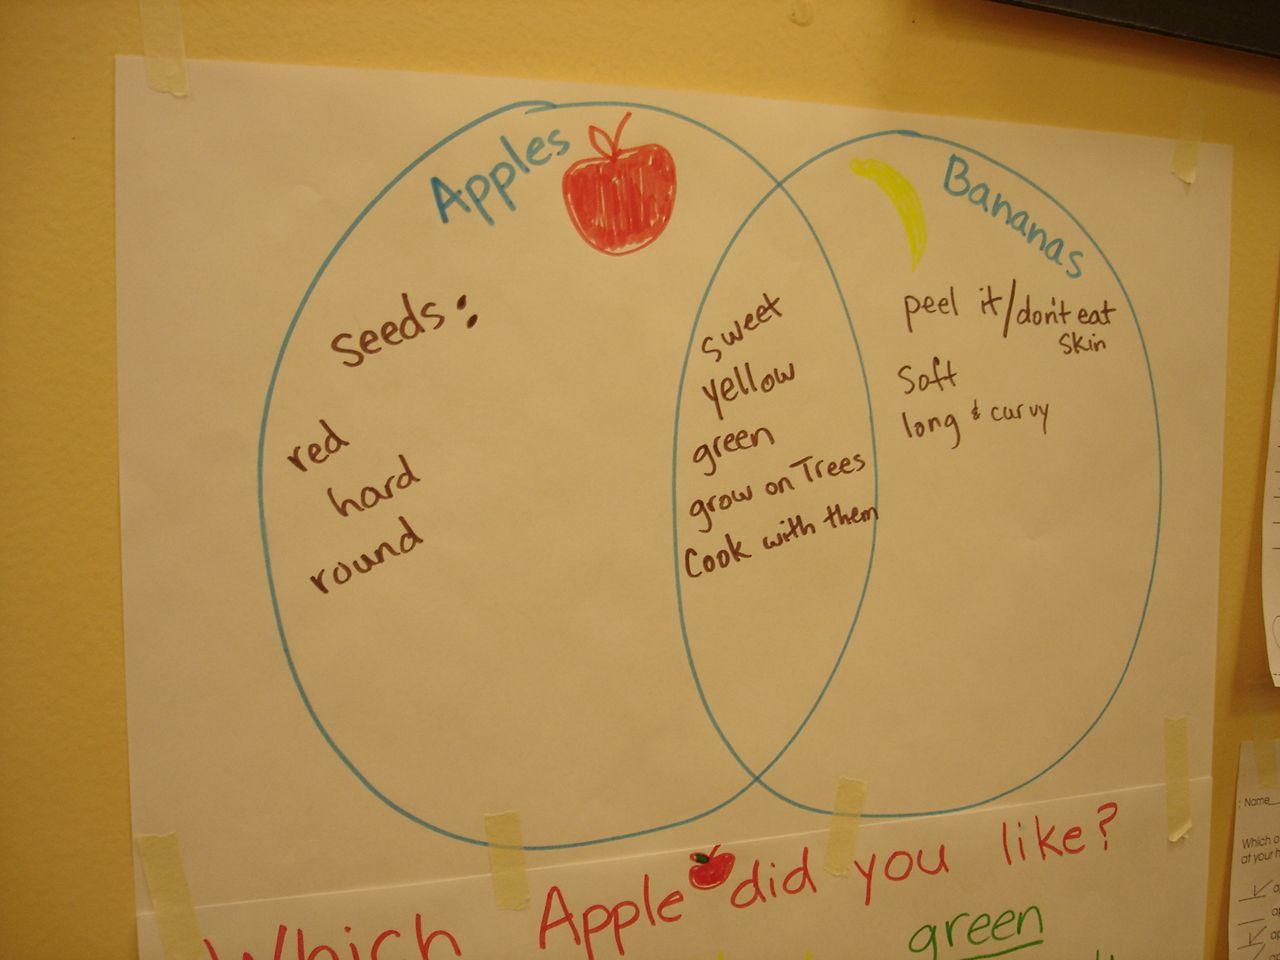 Apple And Contrast Vs Banana Compare